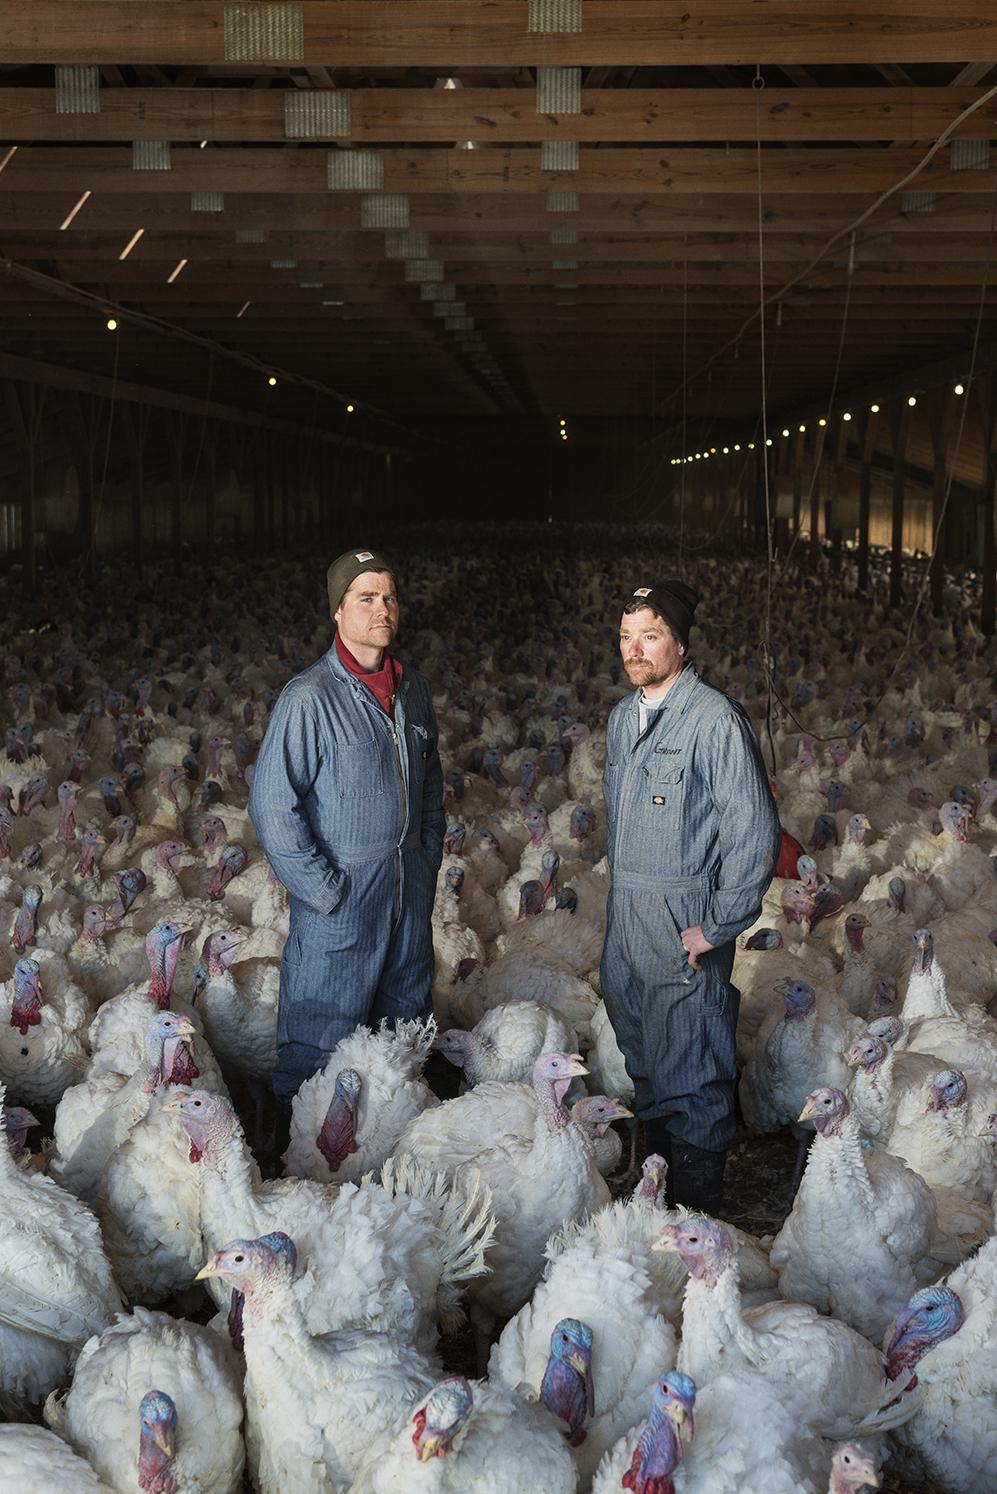 Brad and Grant Moline of Moline Farms, IA